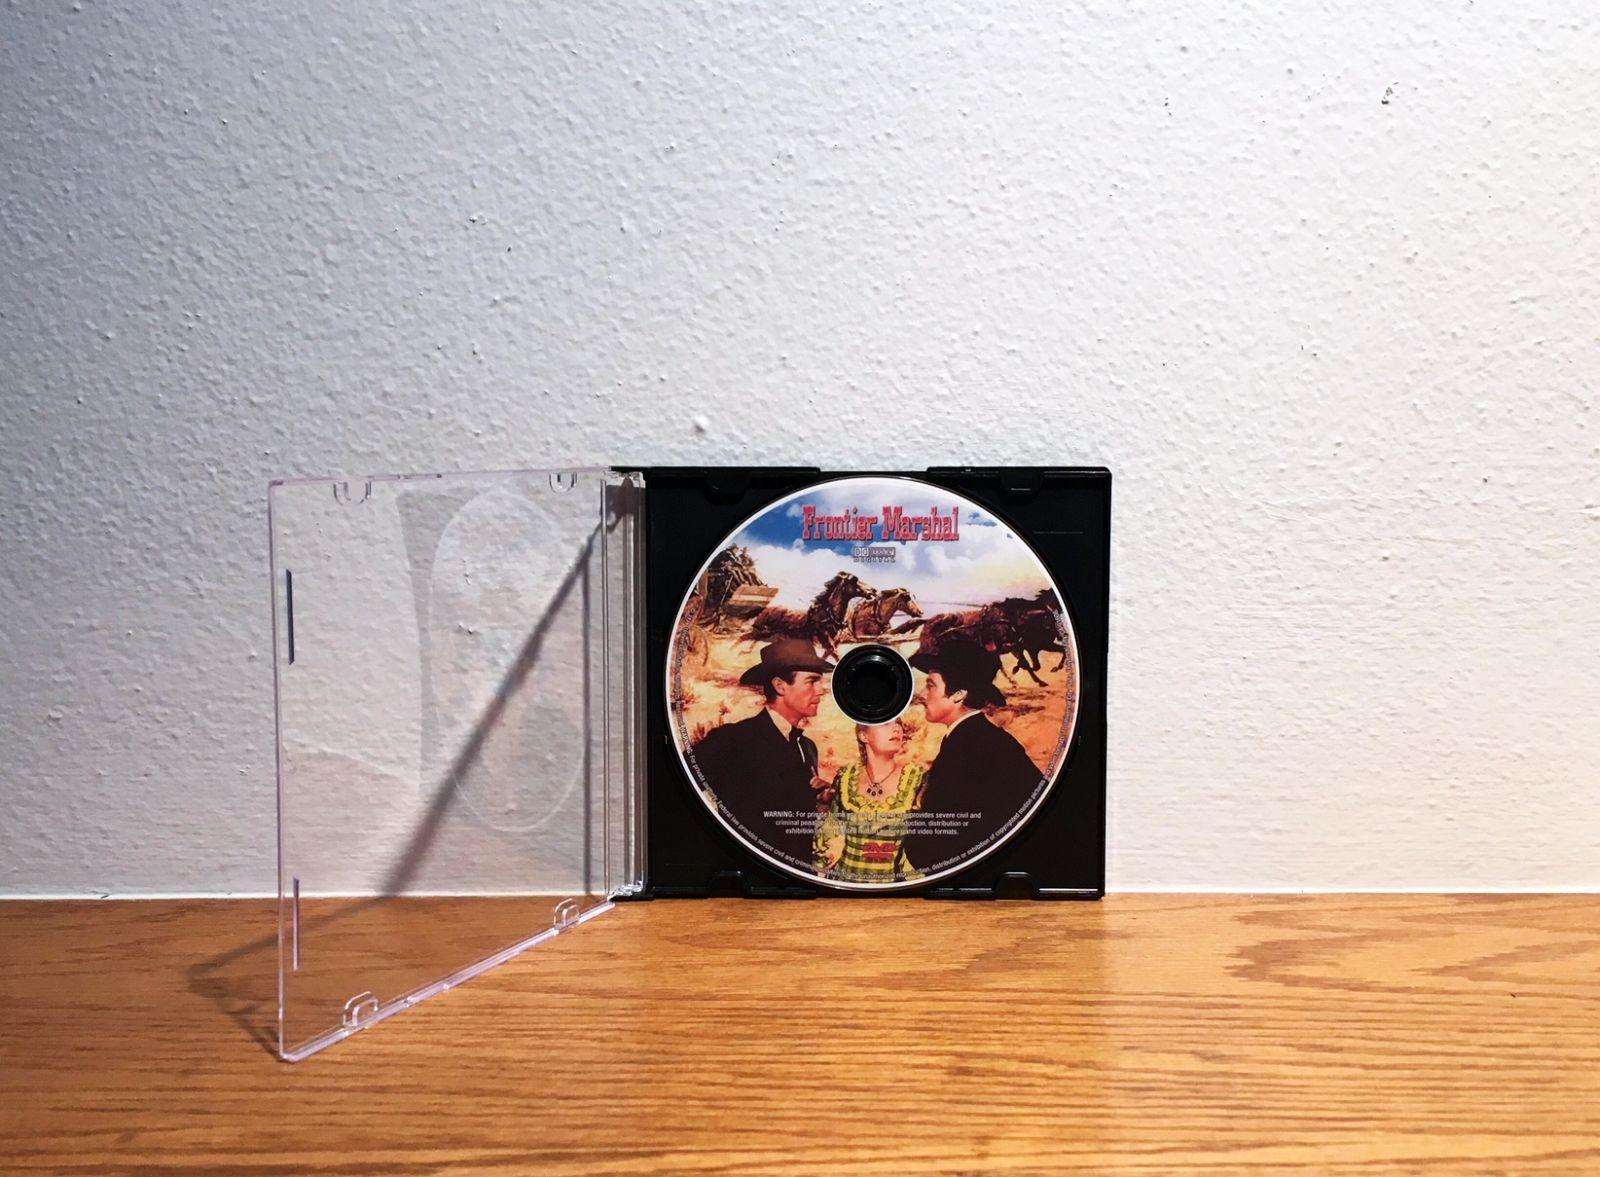 Frontier marshall dvd